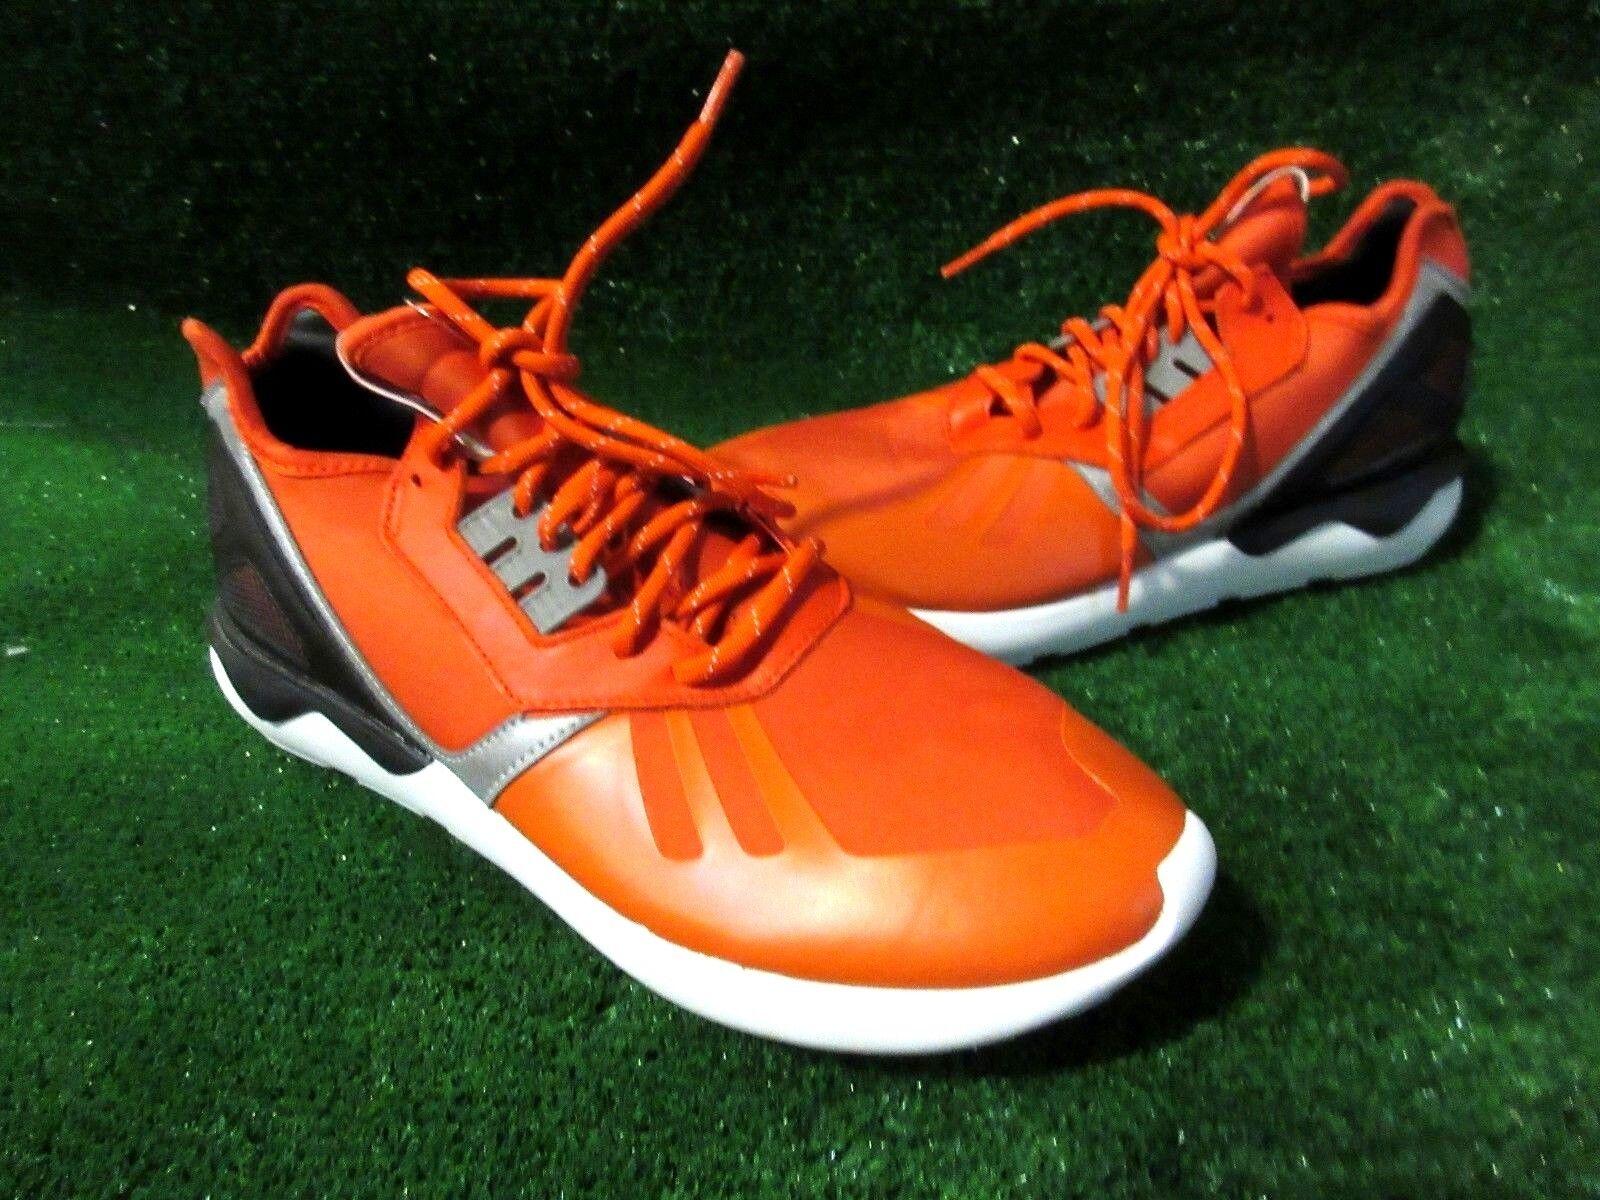 100% authentic d920f 51534 ... Rojo Talla 14 Wild Casual Shoes,. Adidas hombre corredor de tubular de  de de zapatillas para correr de naranja temporada de recortes